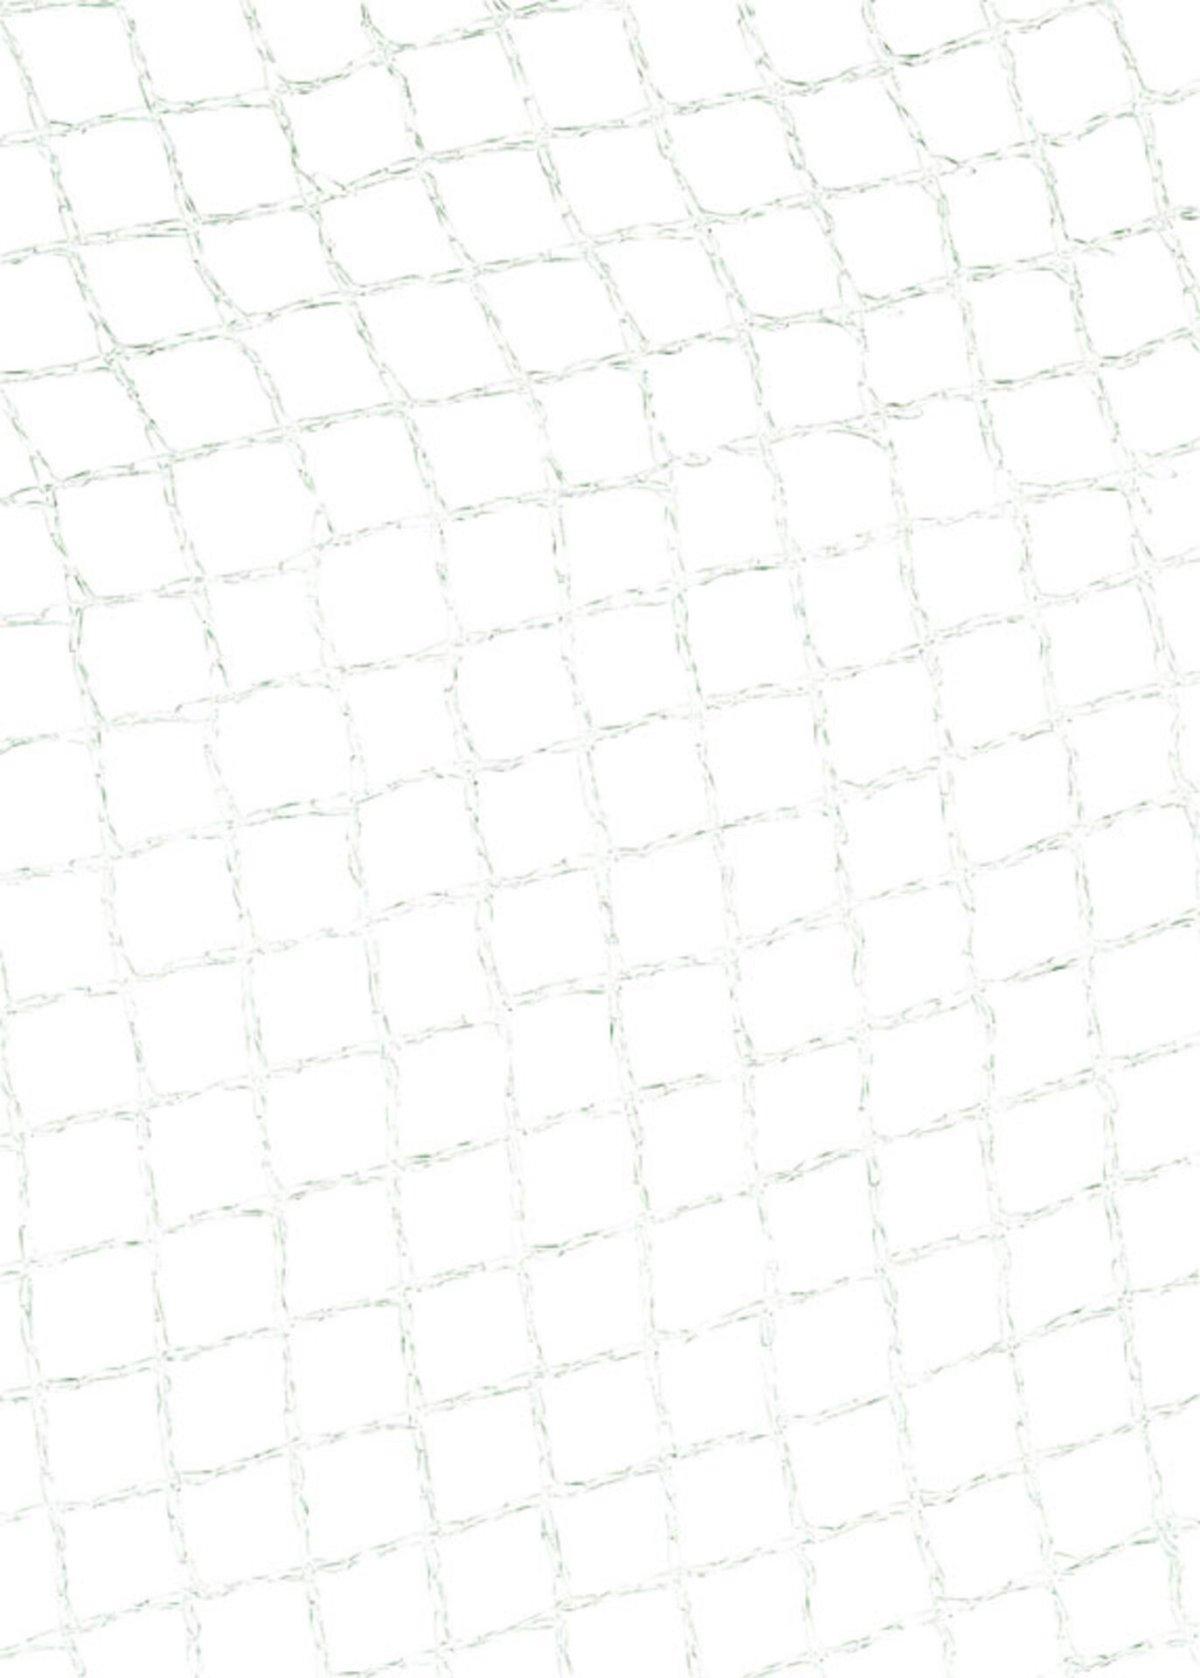 Síť proti listí - 600 x 300 cm (TZ402-00)